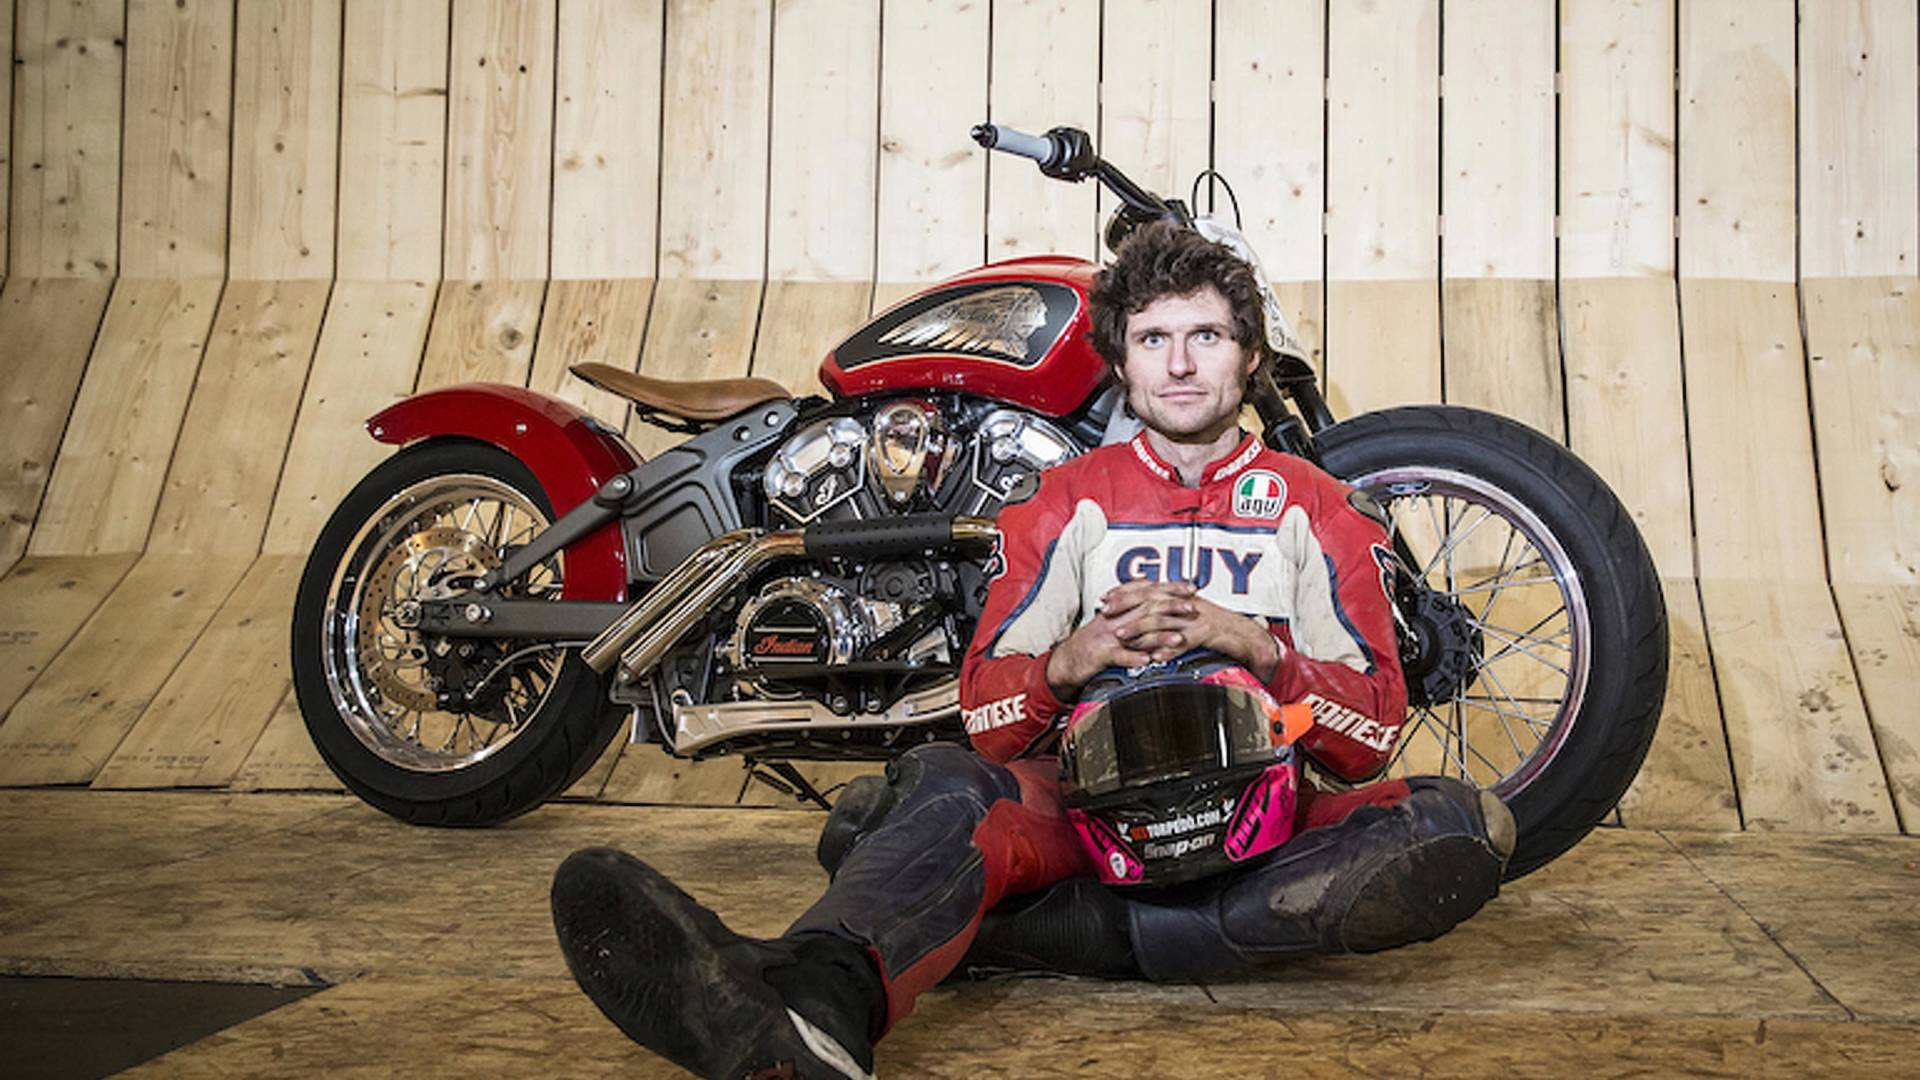 Guy Martin To Pilot Mugen Electric At Isle Of Man TT